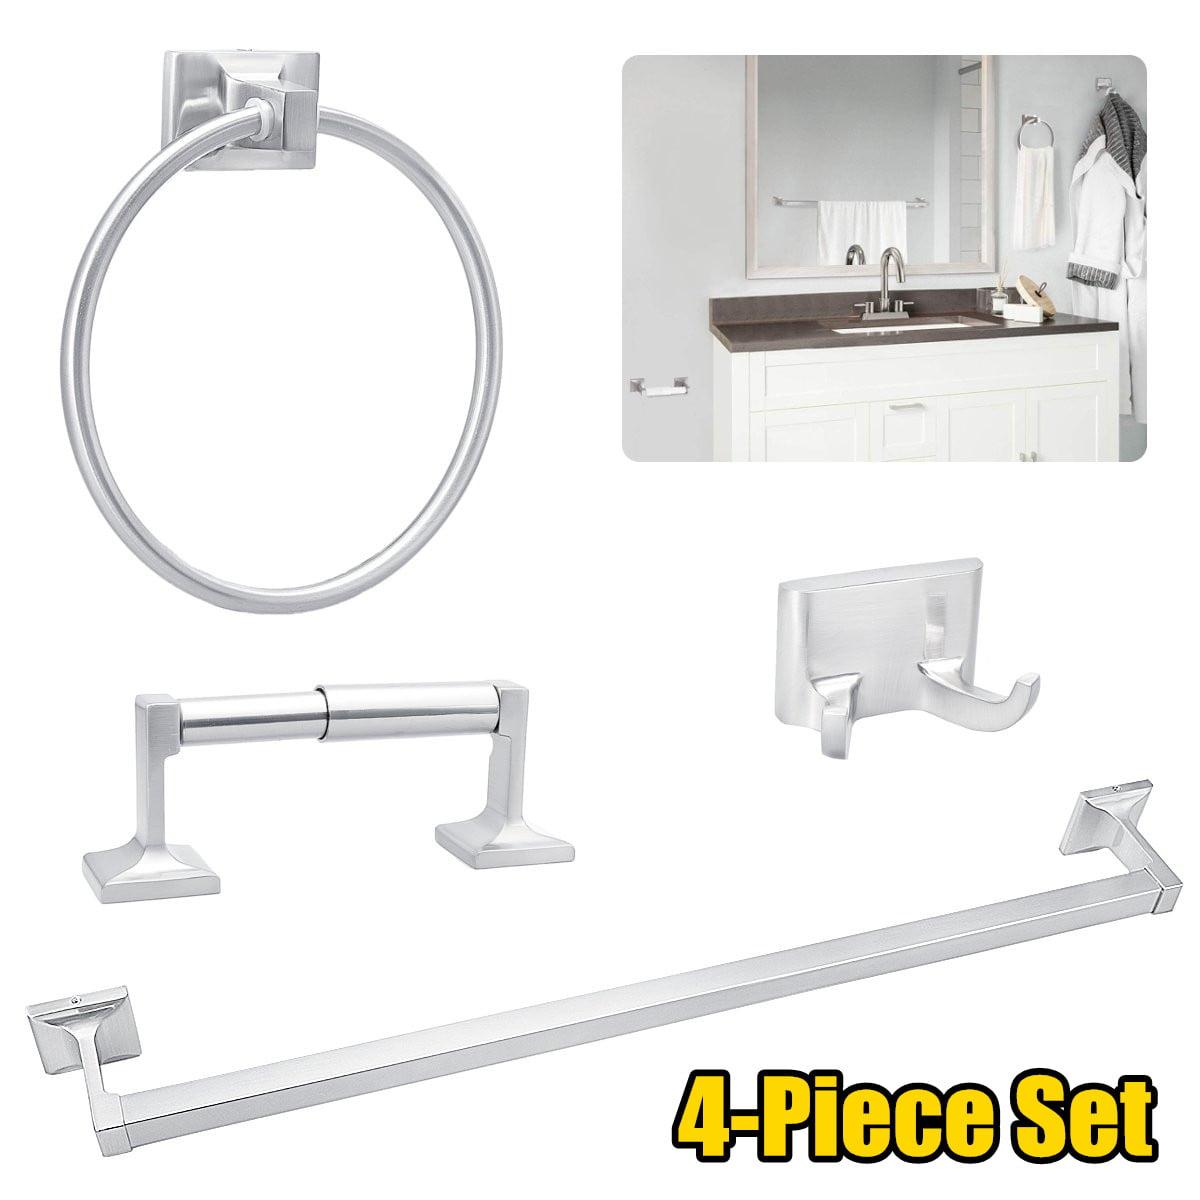 4pcs Bathroom Hardware Stainless Steel